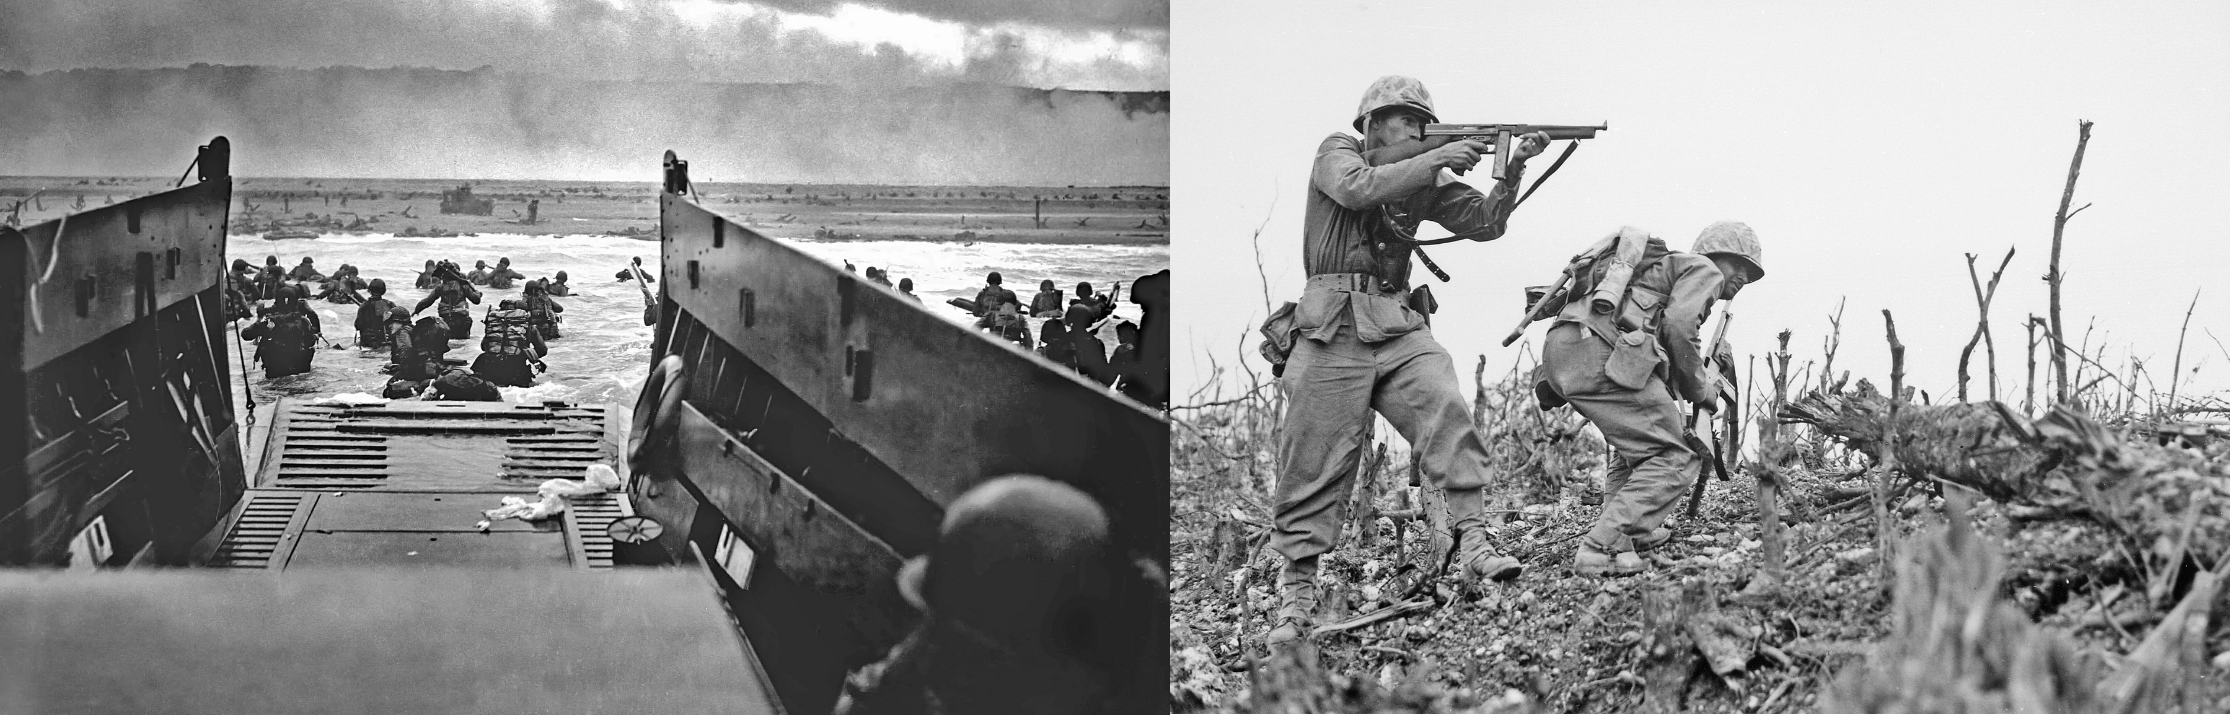 Repro US WW2